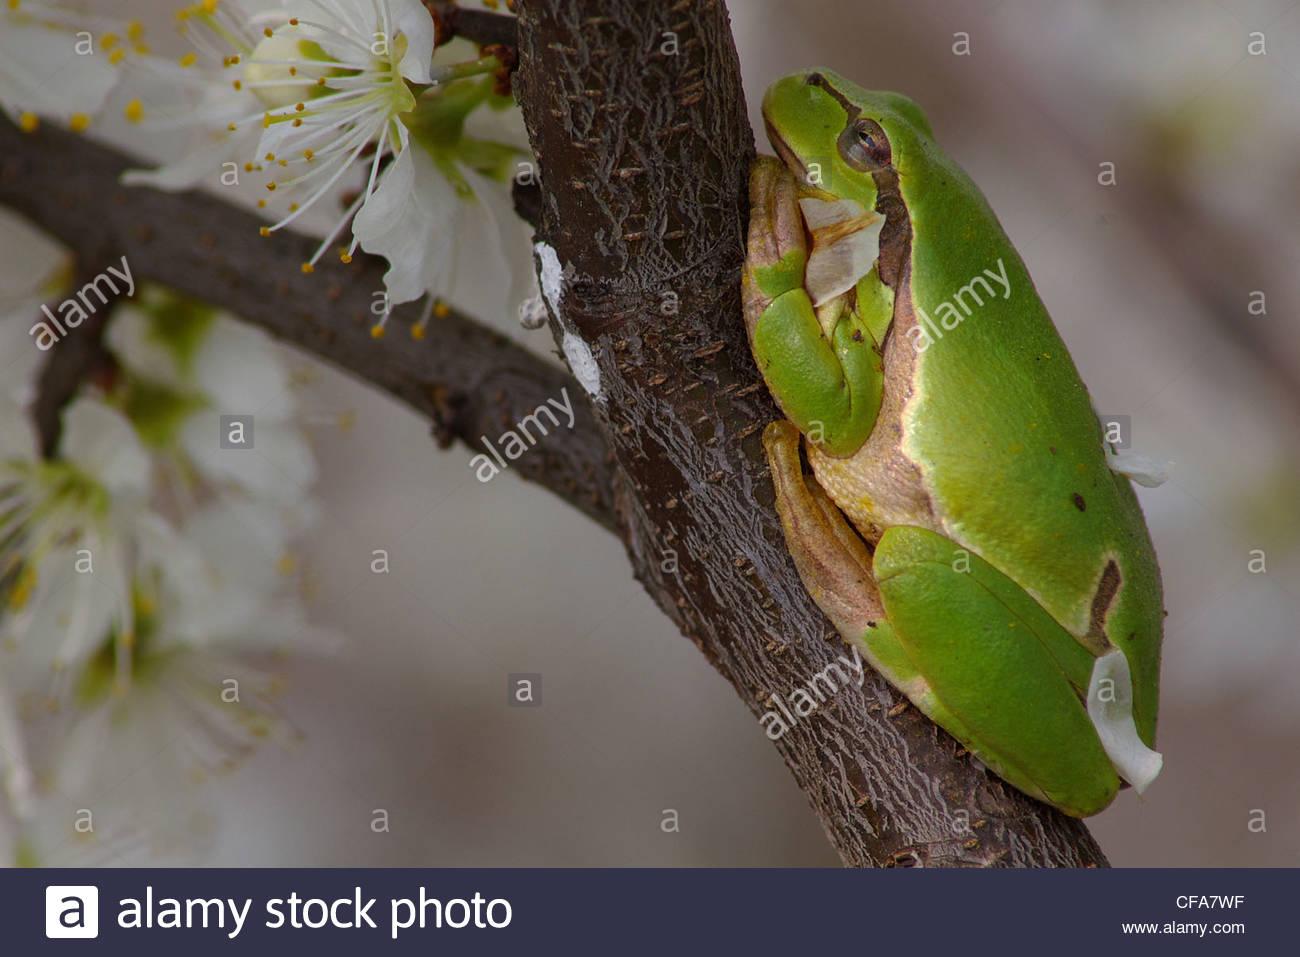 Austria, Burgenland, amphibian, Hylianea, European tree frog, tree frog, Hyla arborea, on shrub Stock Photo